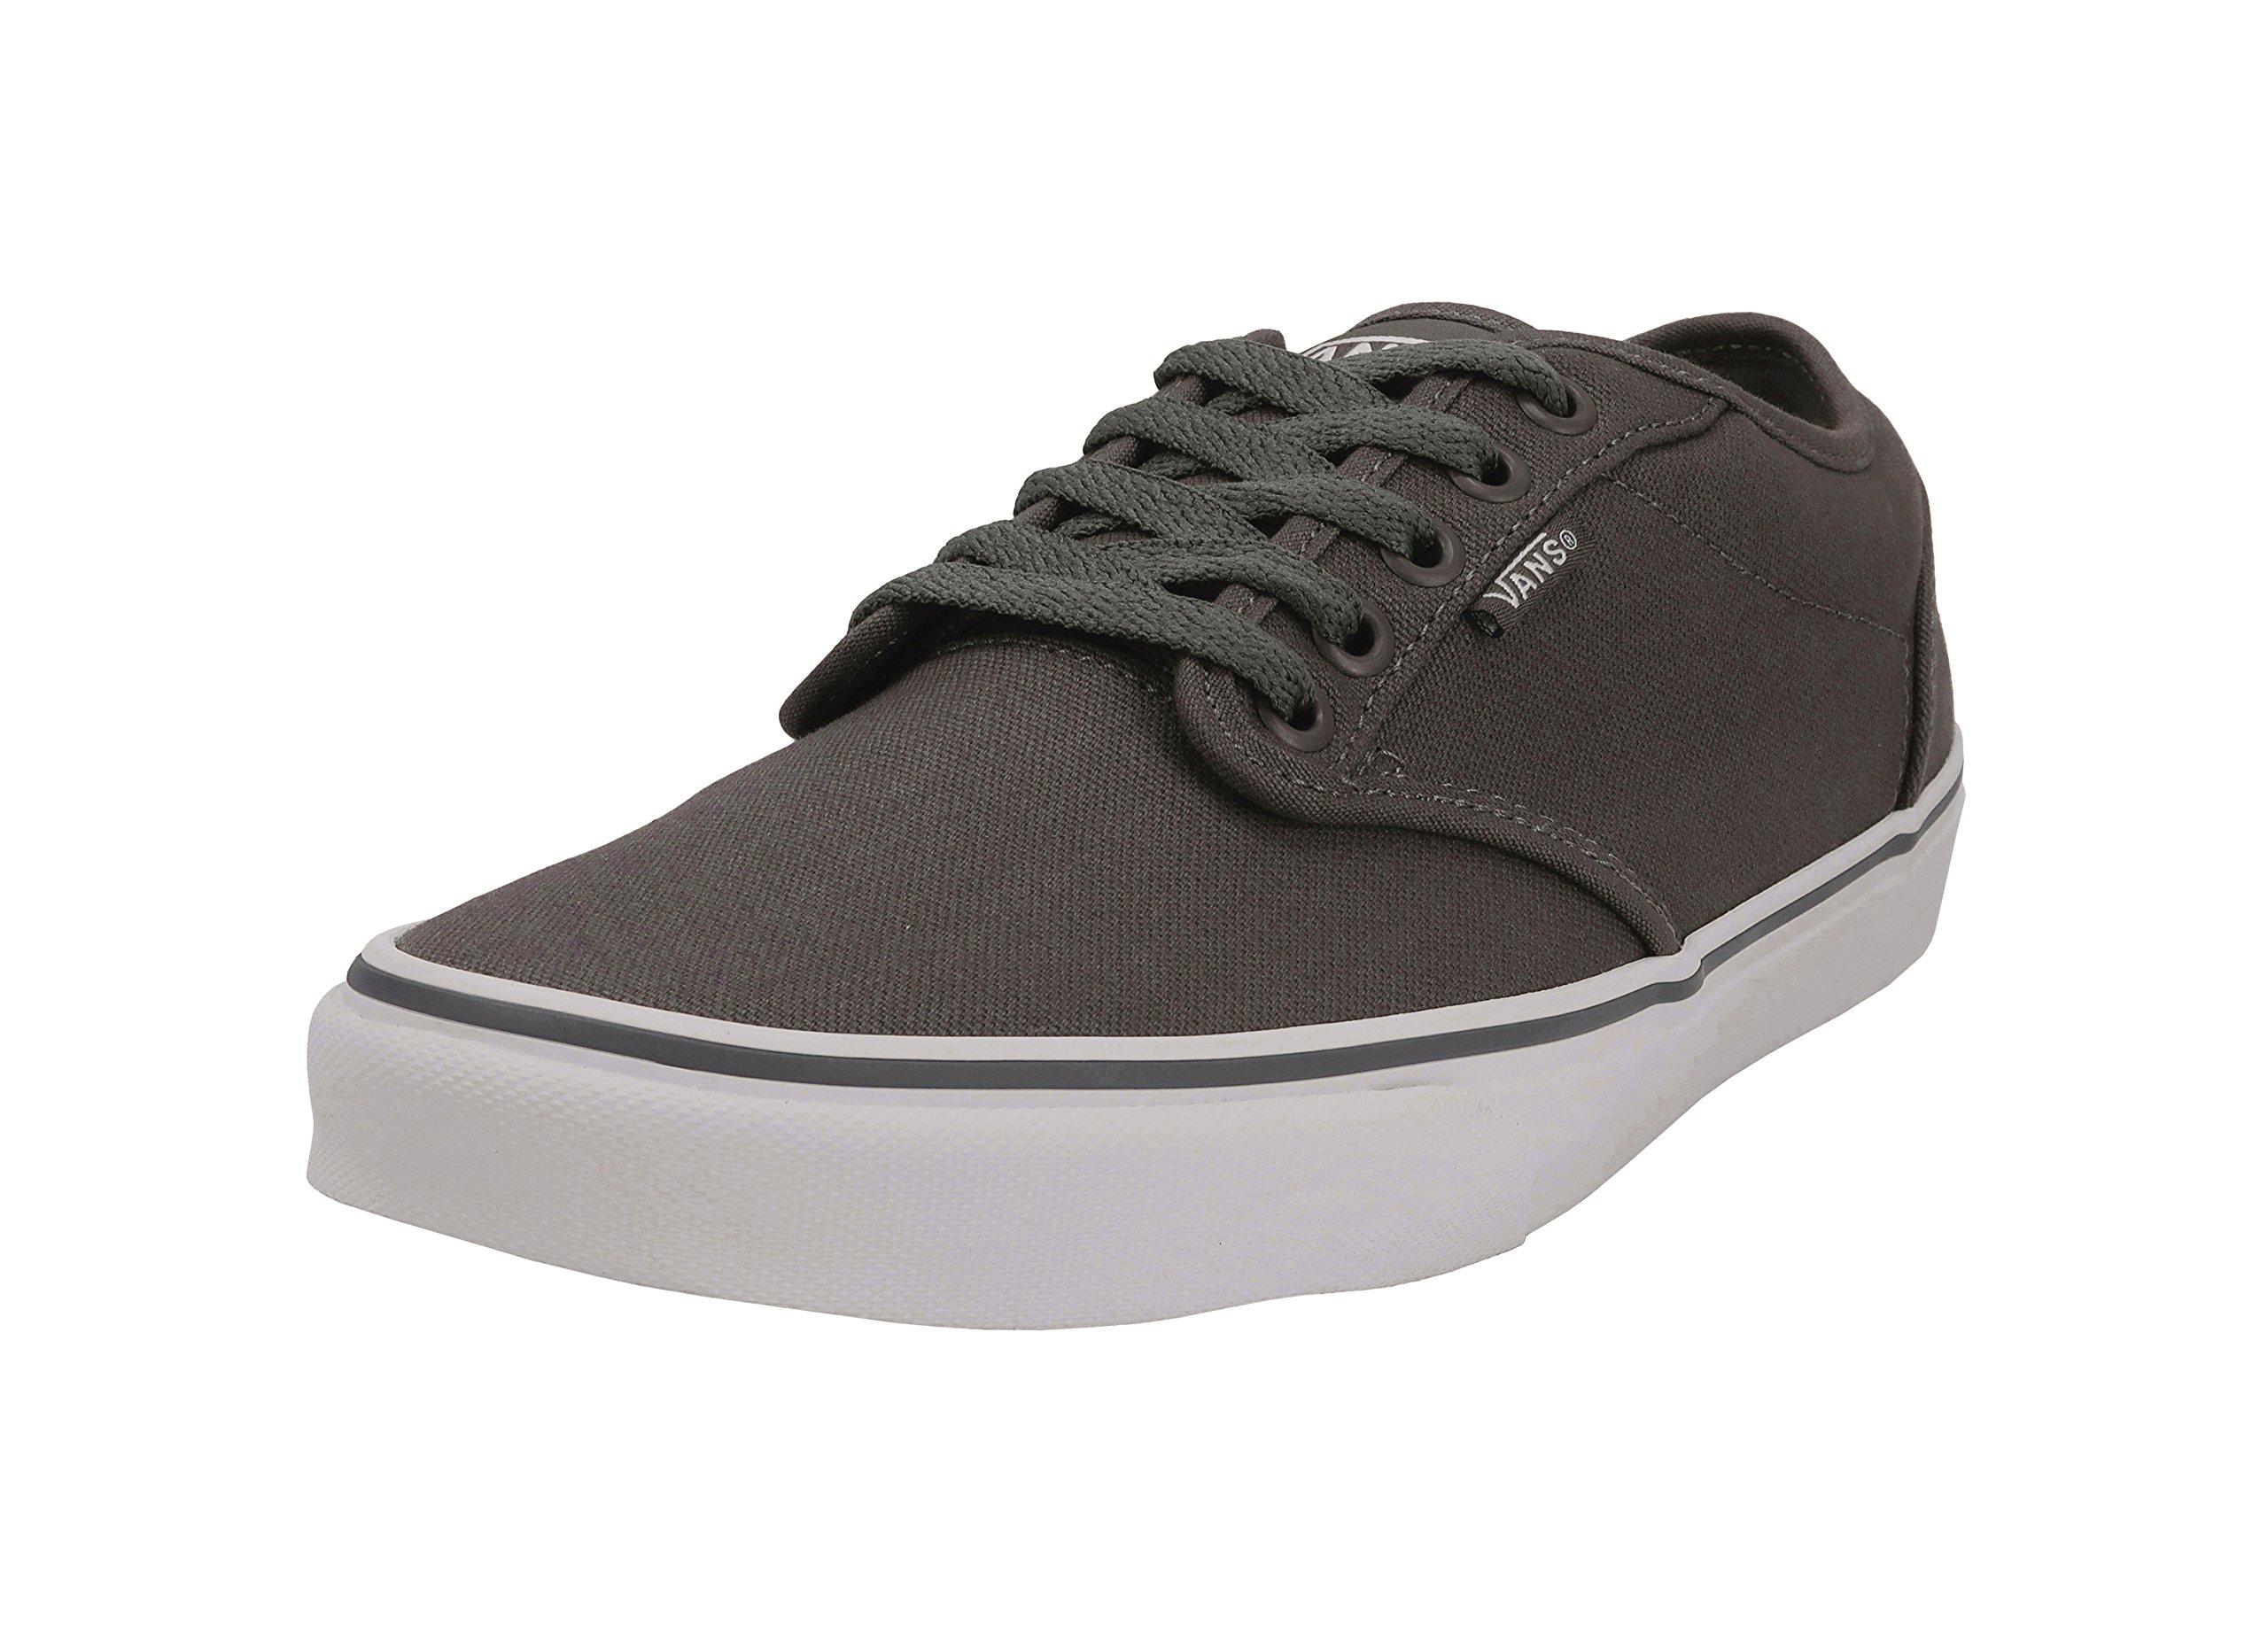 Vans Men's Atwood (Canvas) Pewter/White Skate Shoe 7.5 Men US by Vans